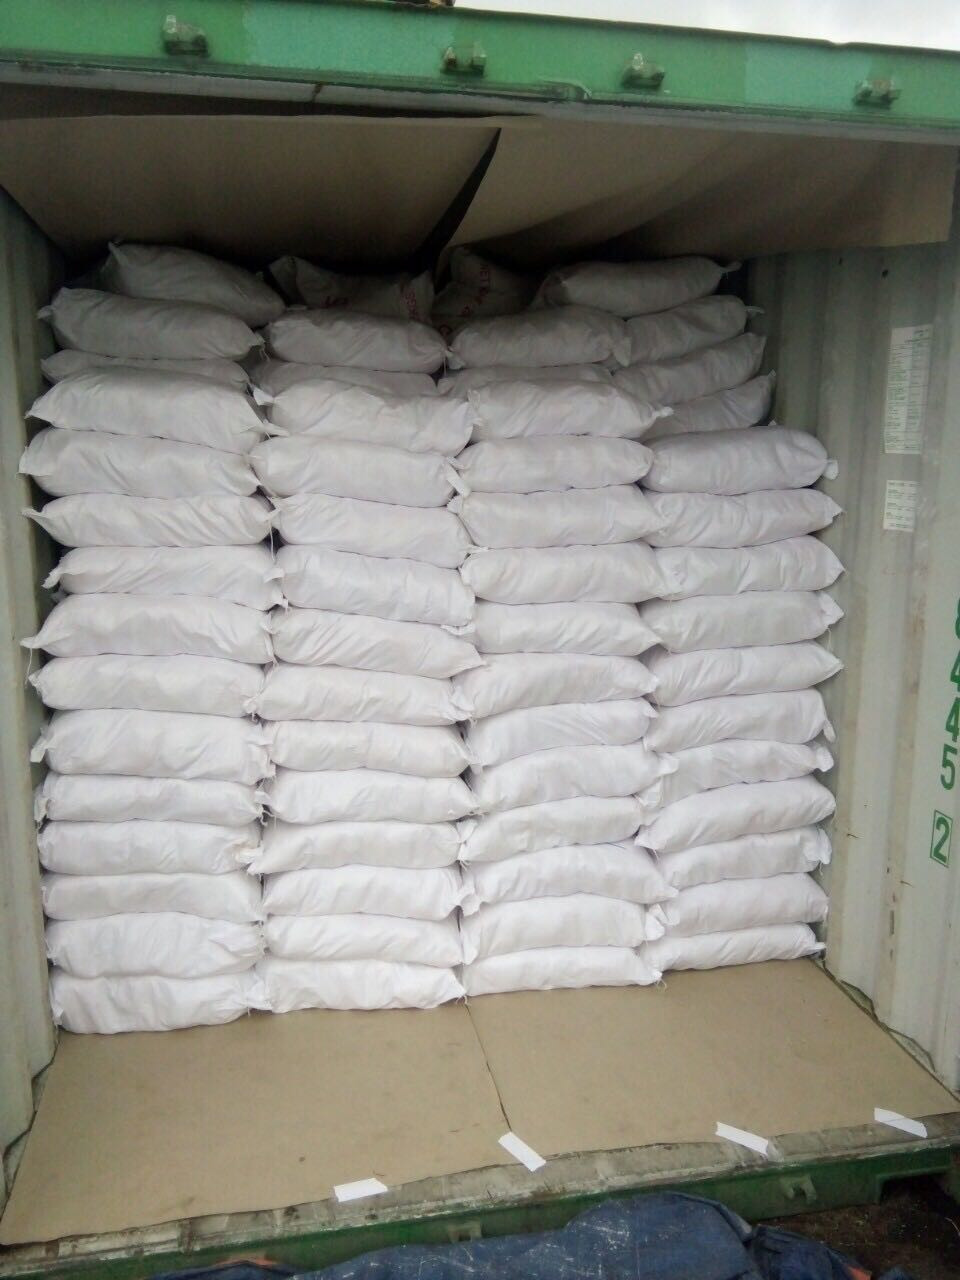 WhiteOxen Premium Jasmine Rice shipment packing 1kg for donation